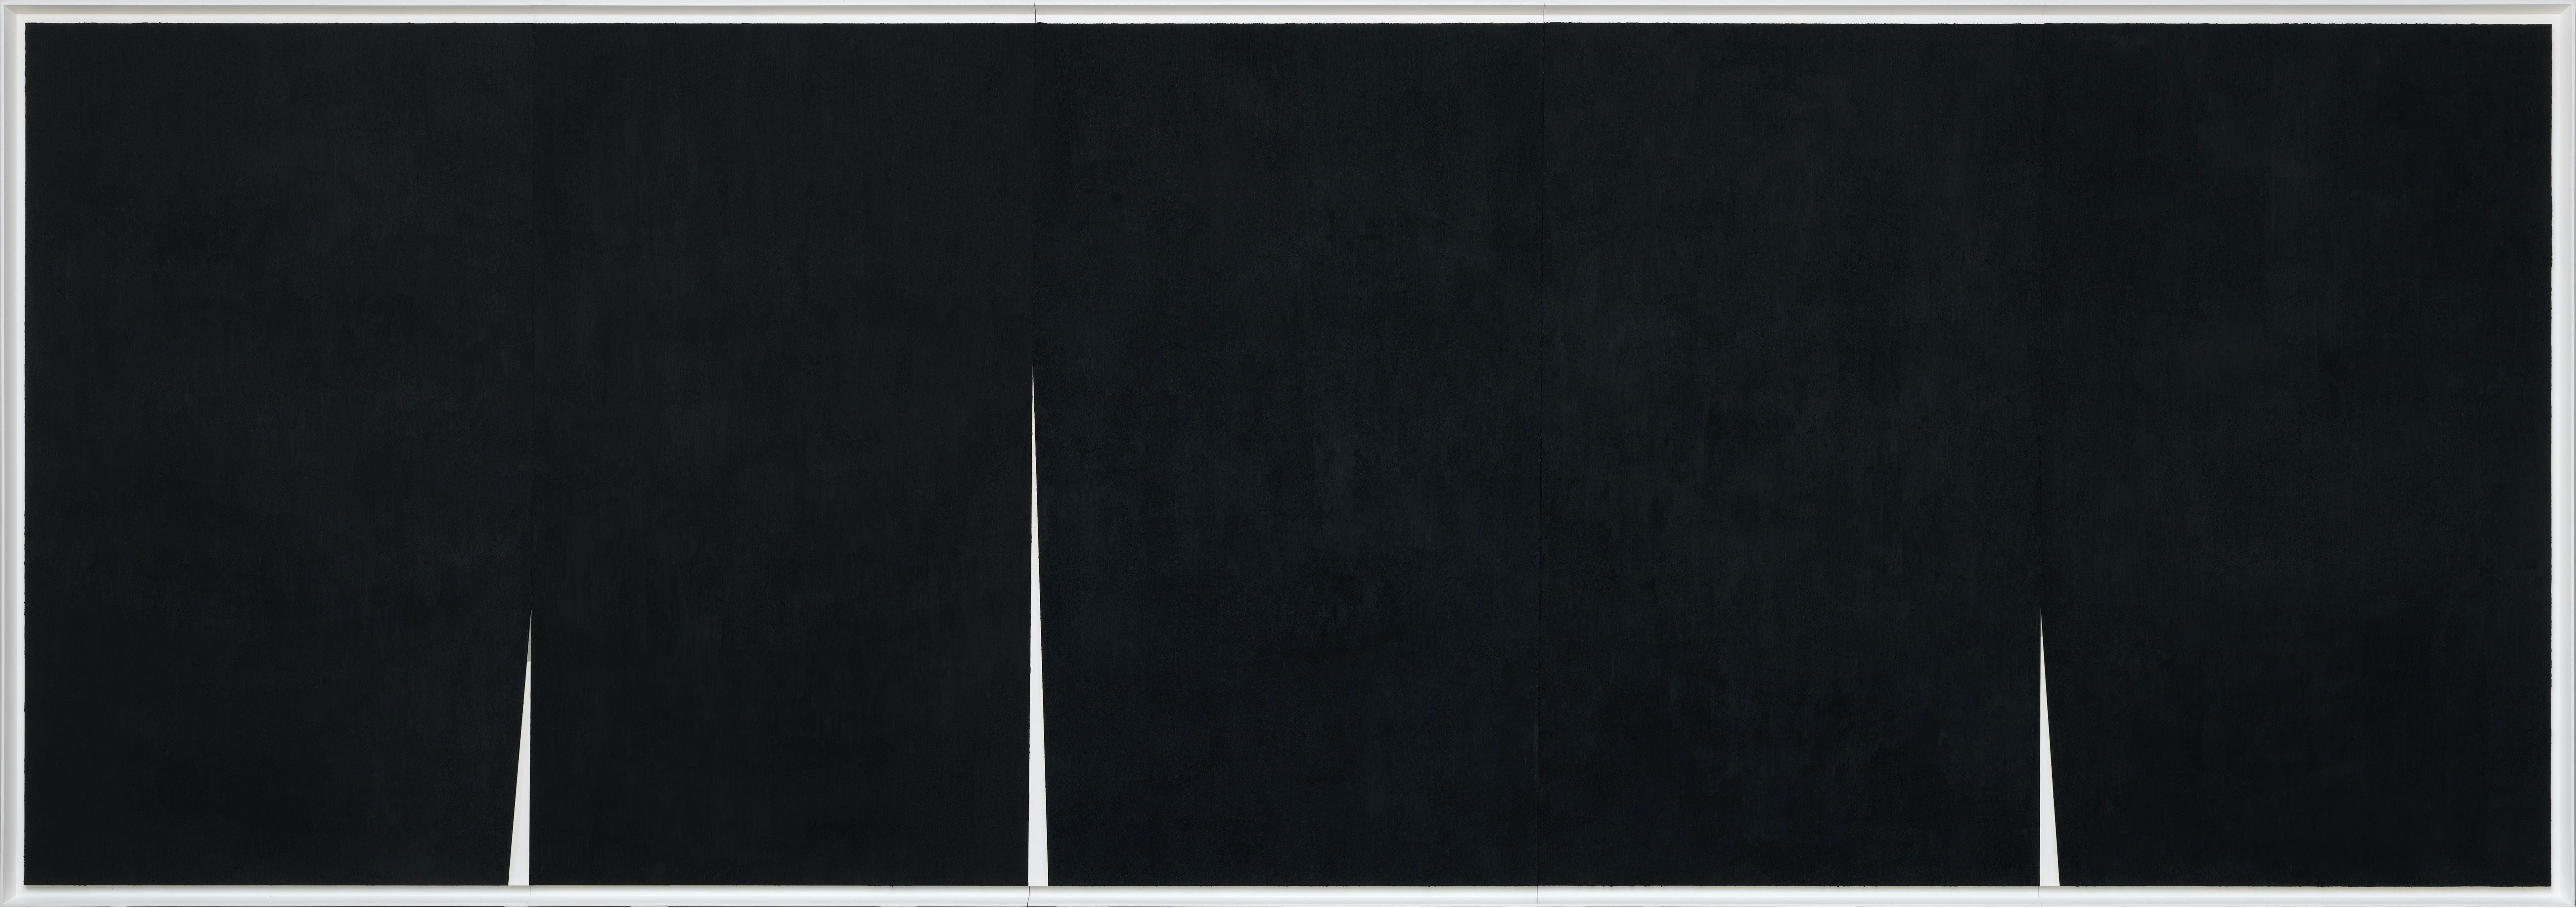 Quadruple Rift (2017), Richard Serra. The Menil Collection, Houston.